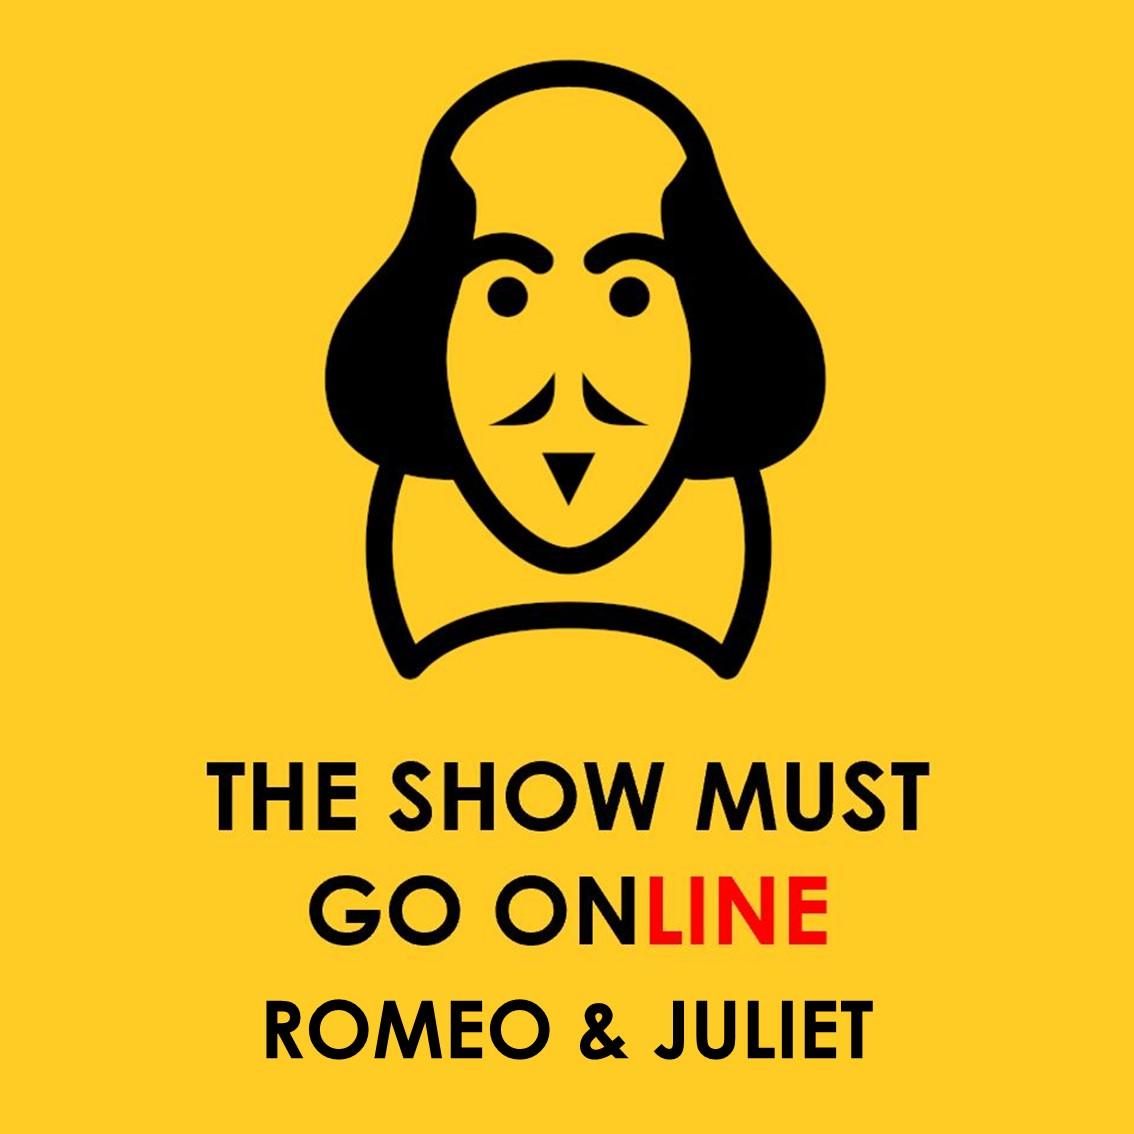 The Show Must Go Online – Romeo & Juliet Thumbnail